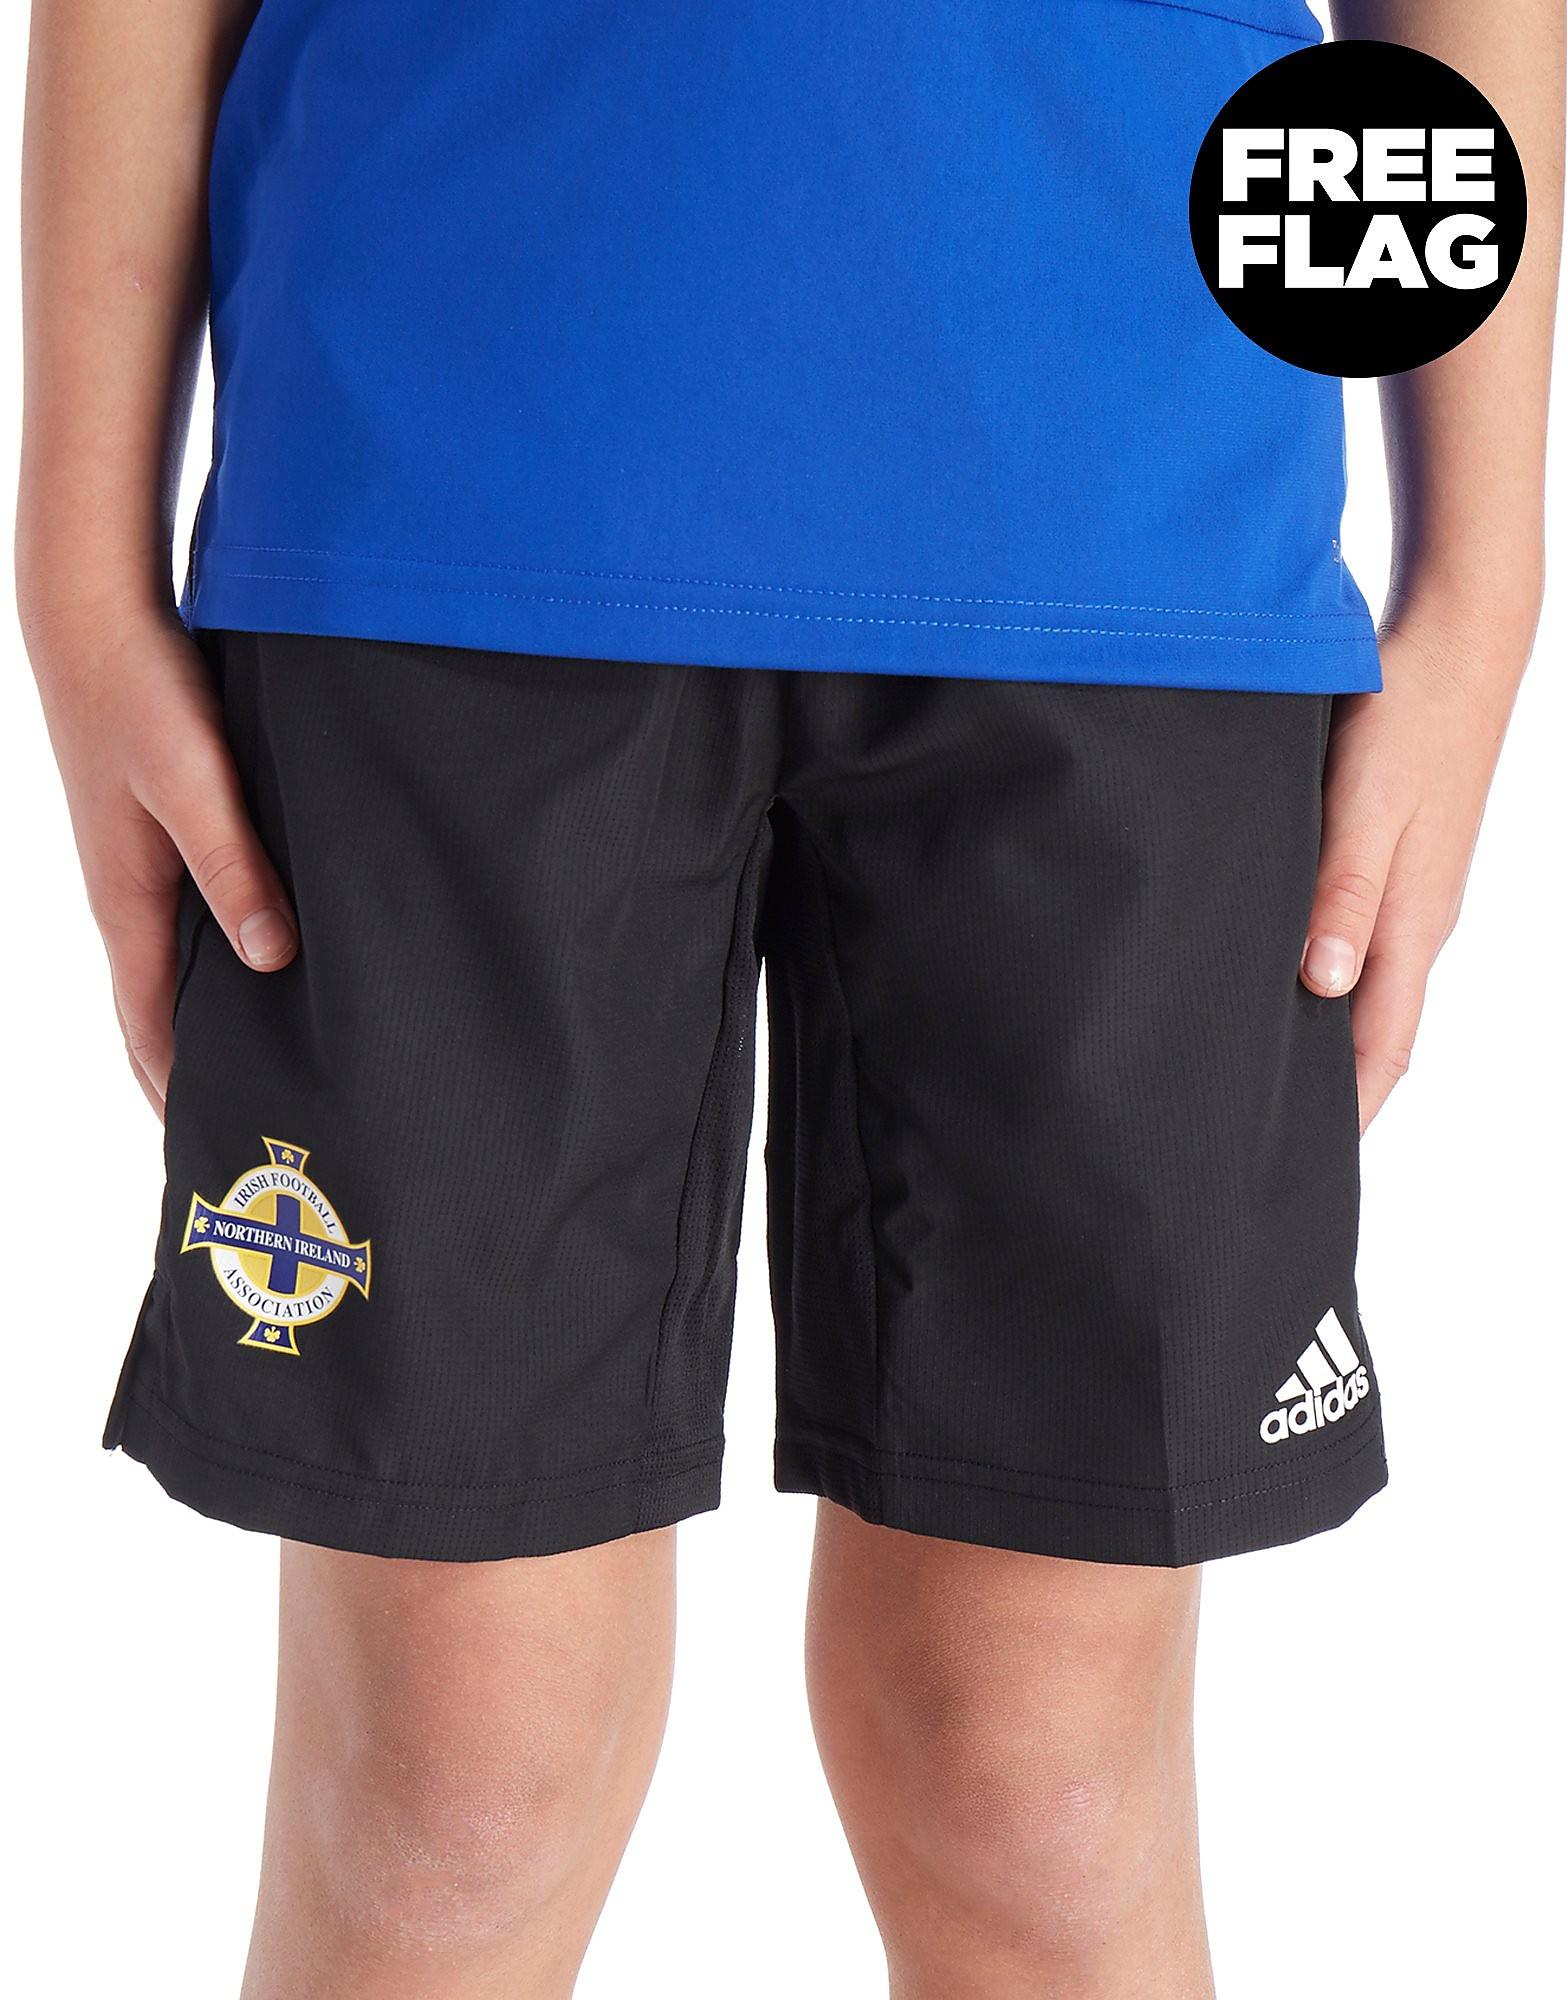 adidas Northern Ireland 2018 Woven Shorts Junior